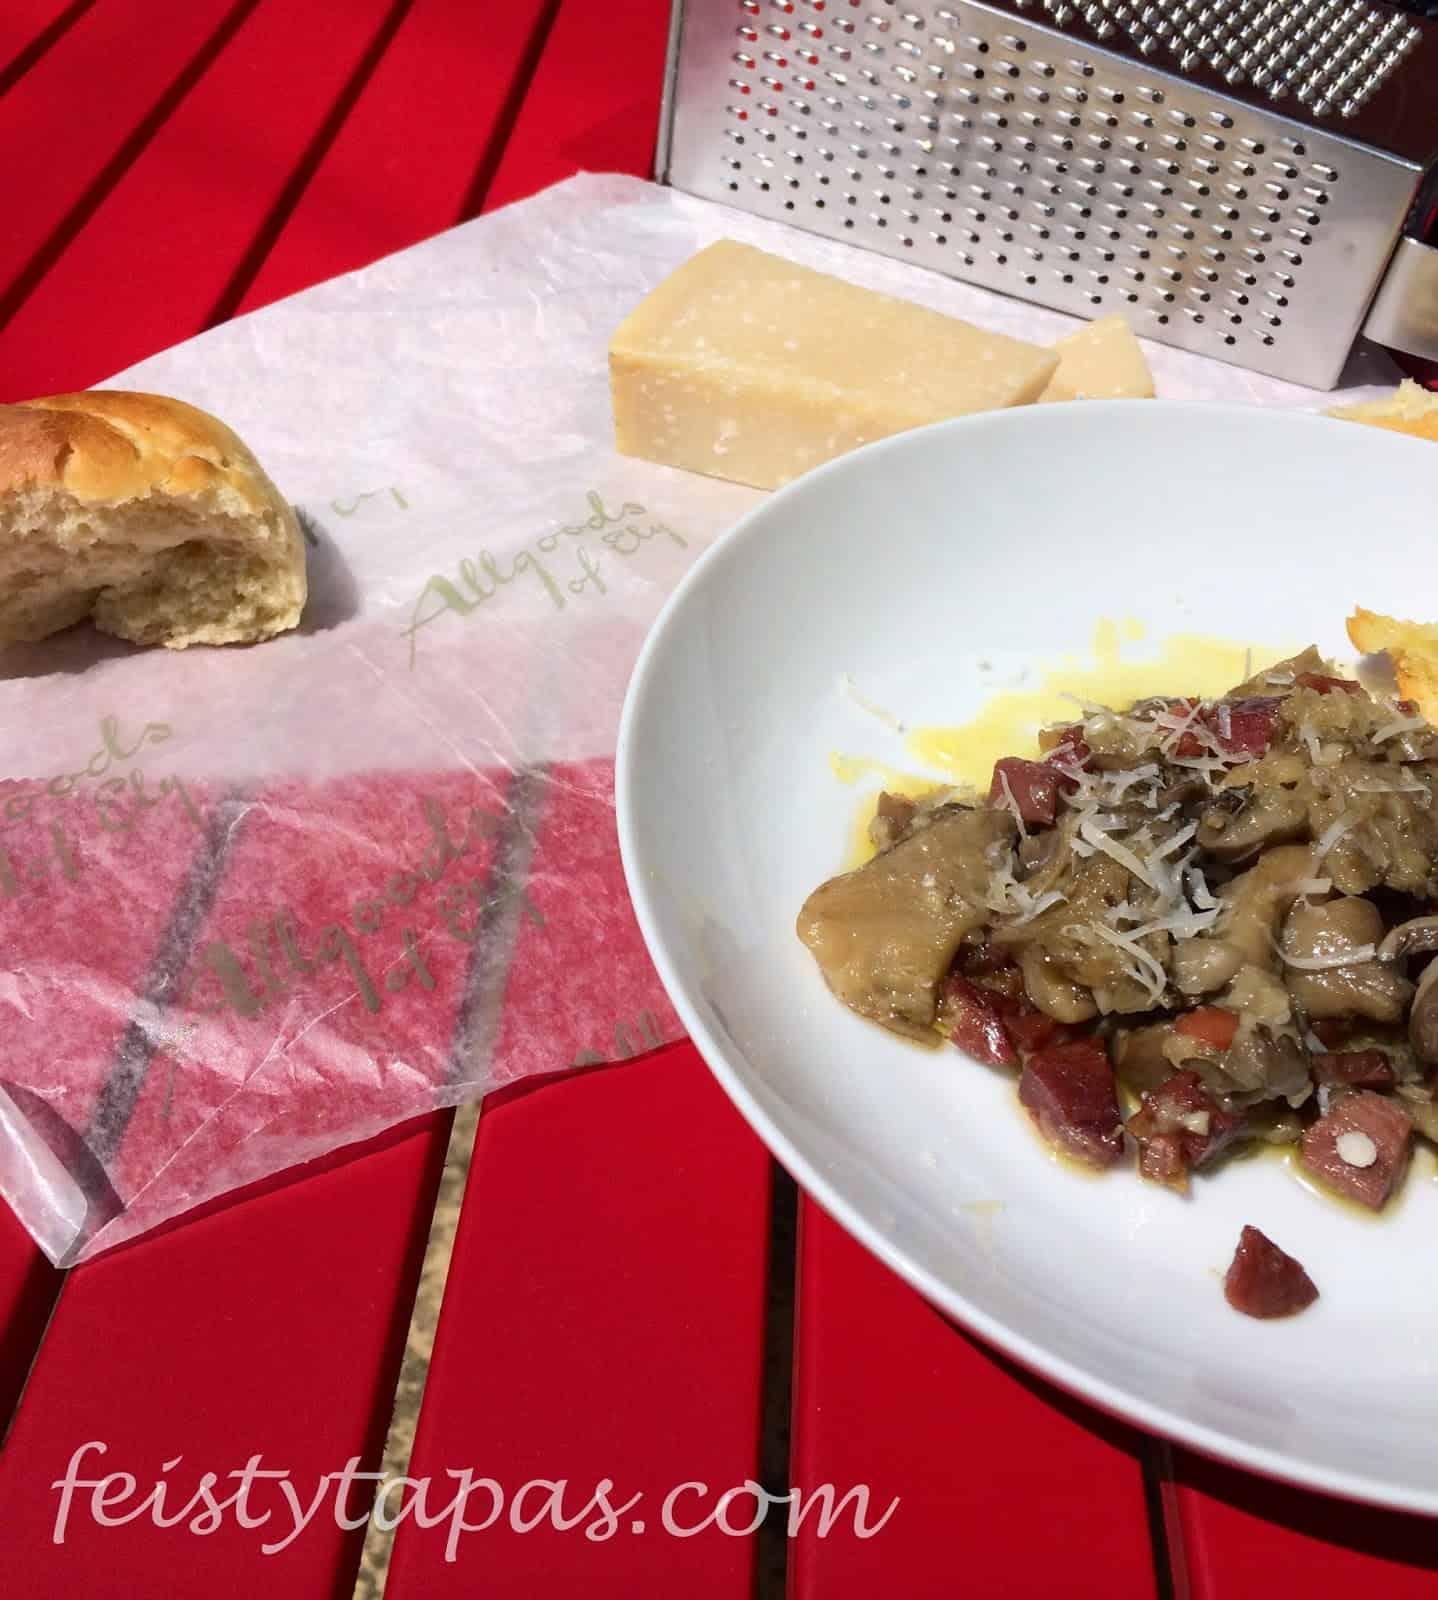 Garlic and serrano ham mushrooms (Thermomix and conventional recipe)